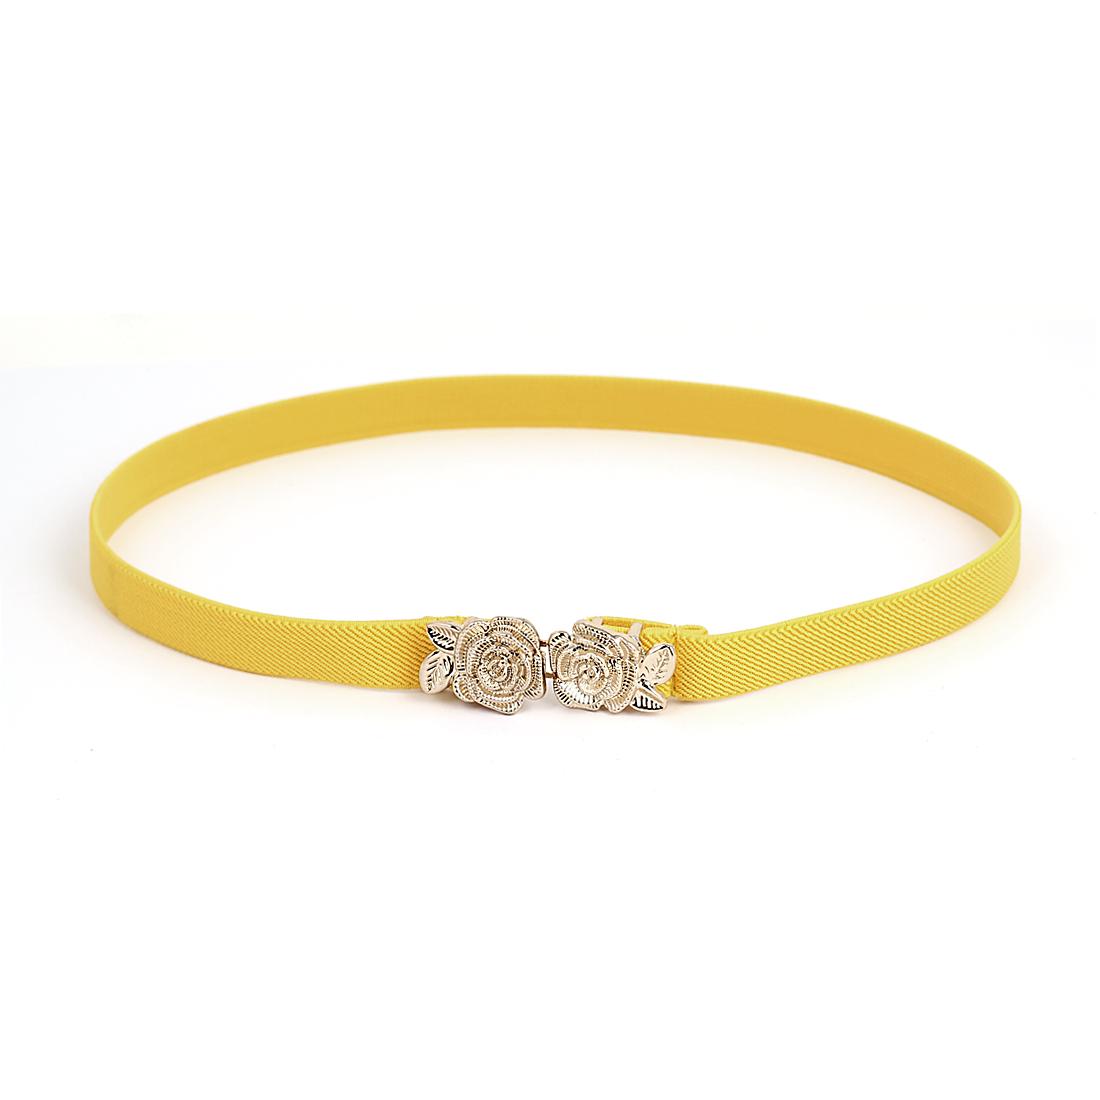 Lady Flower Shape Interlocking Buckle Elastic Band Waist Cinch Belt Yellow